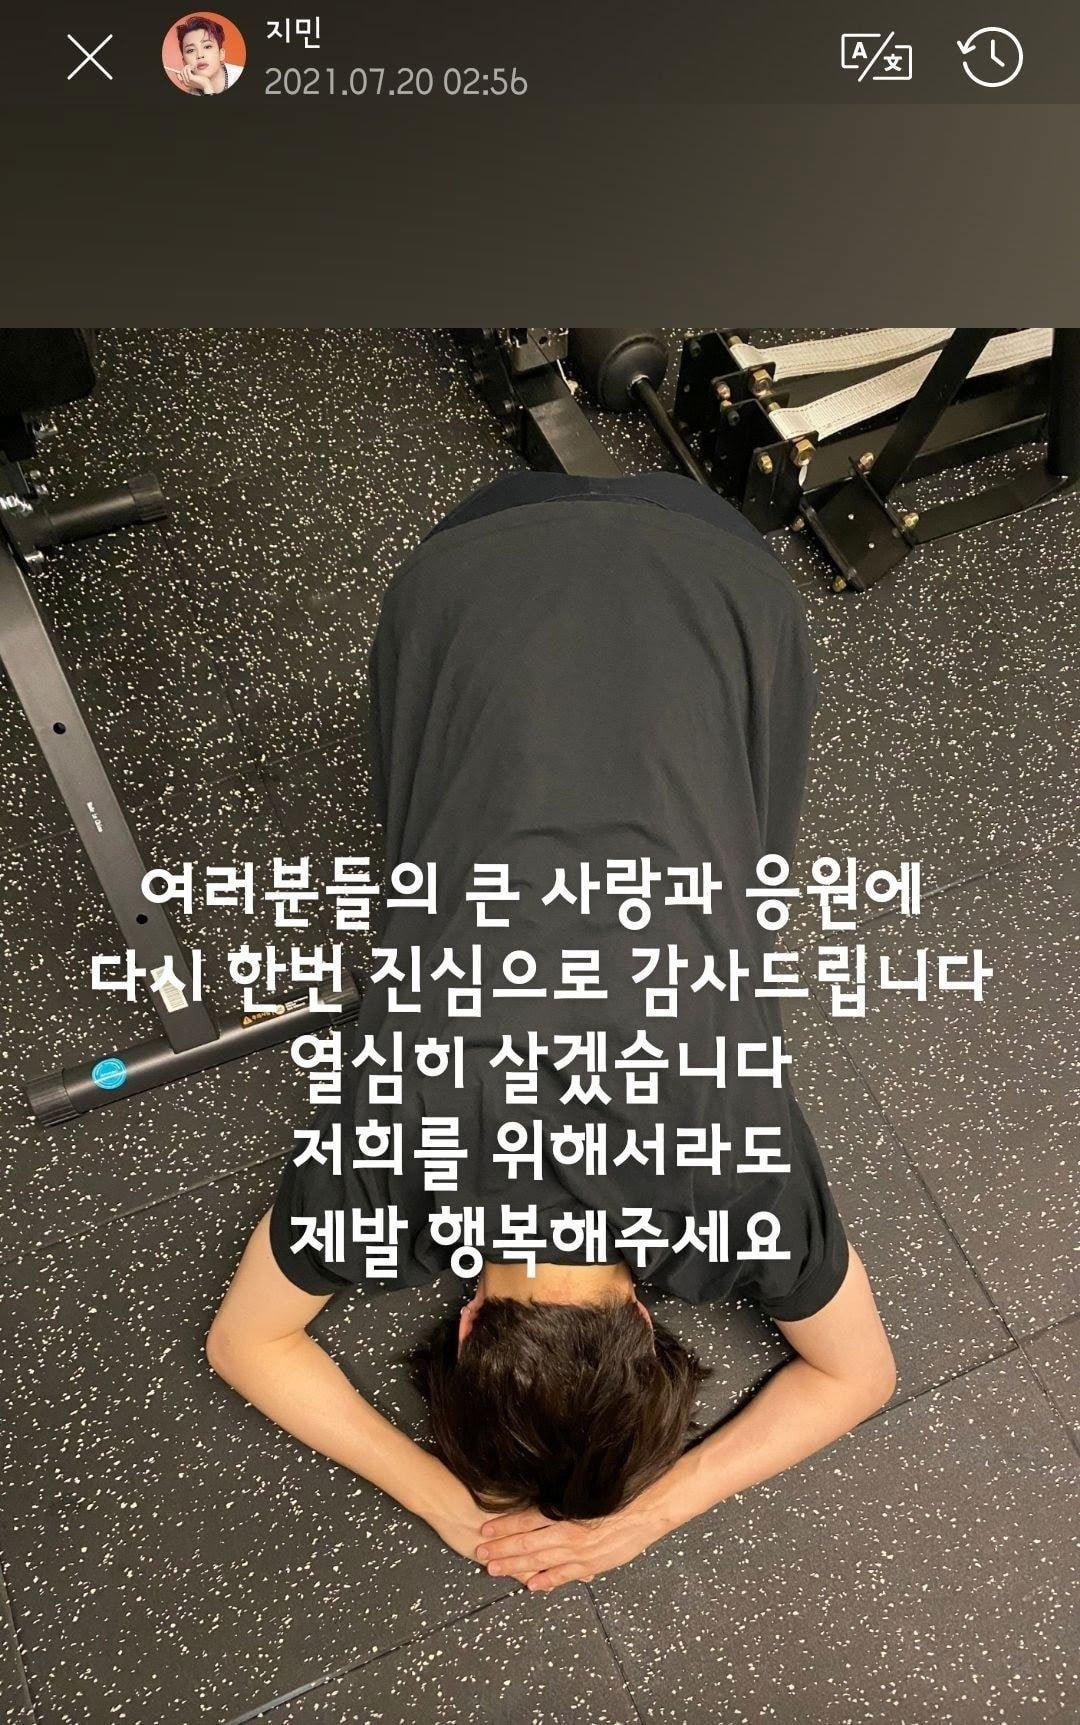 BTS' Suga, Jimin release heartwarming video message amid 'Permission to Dance' success